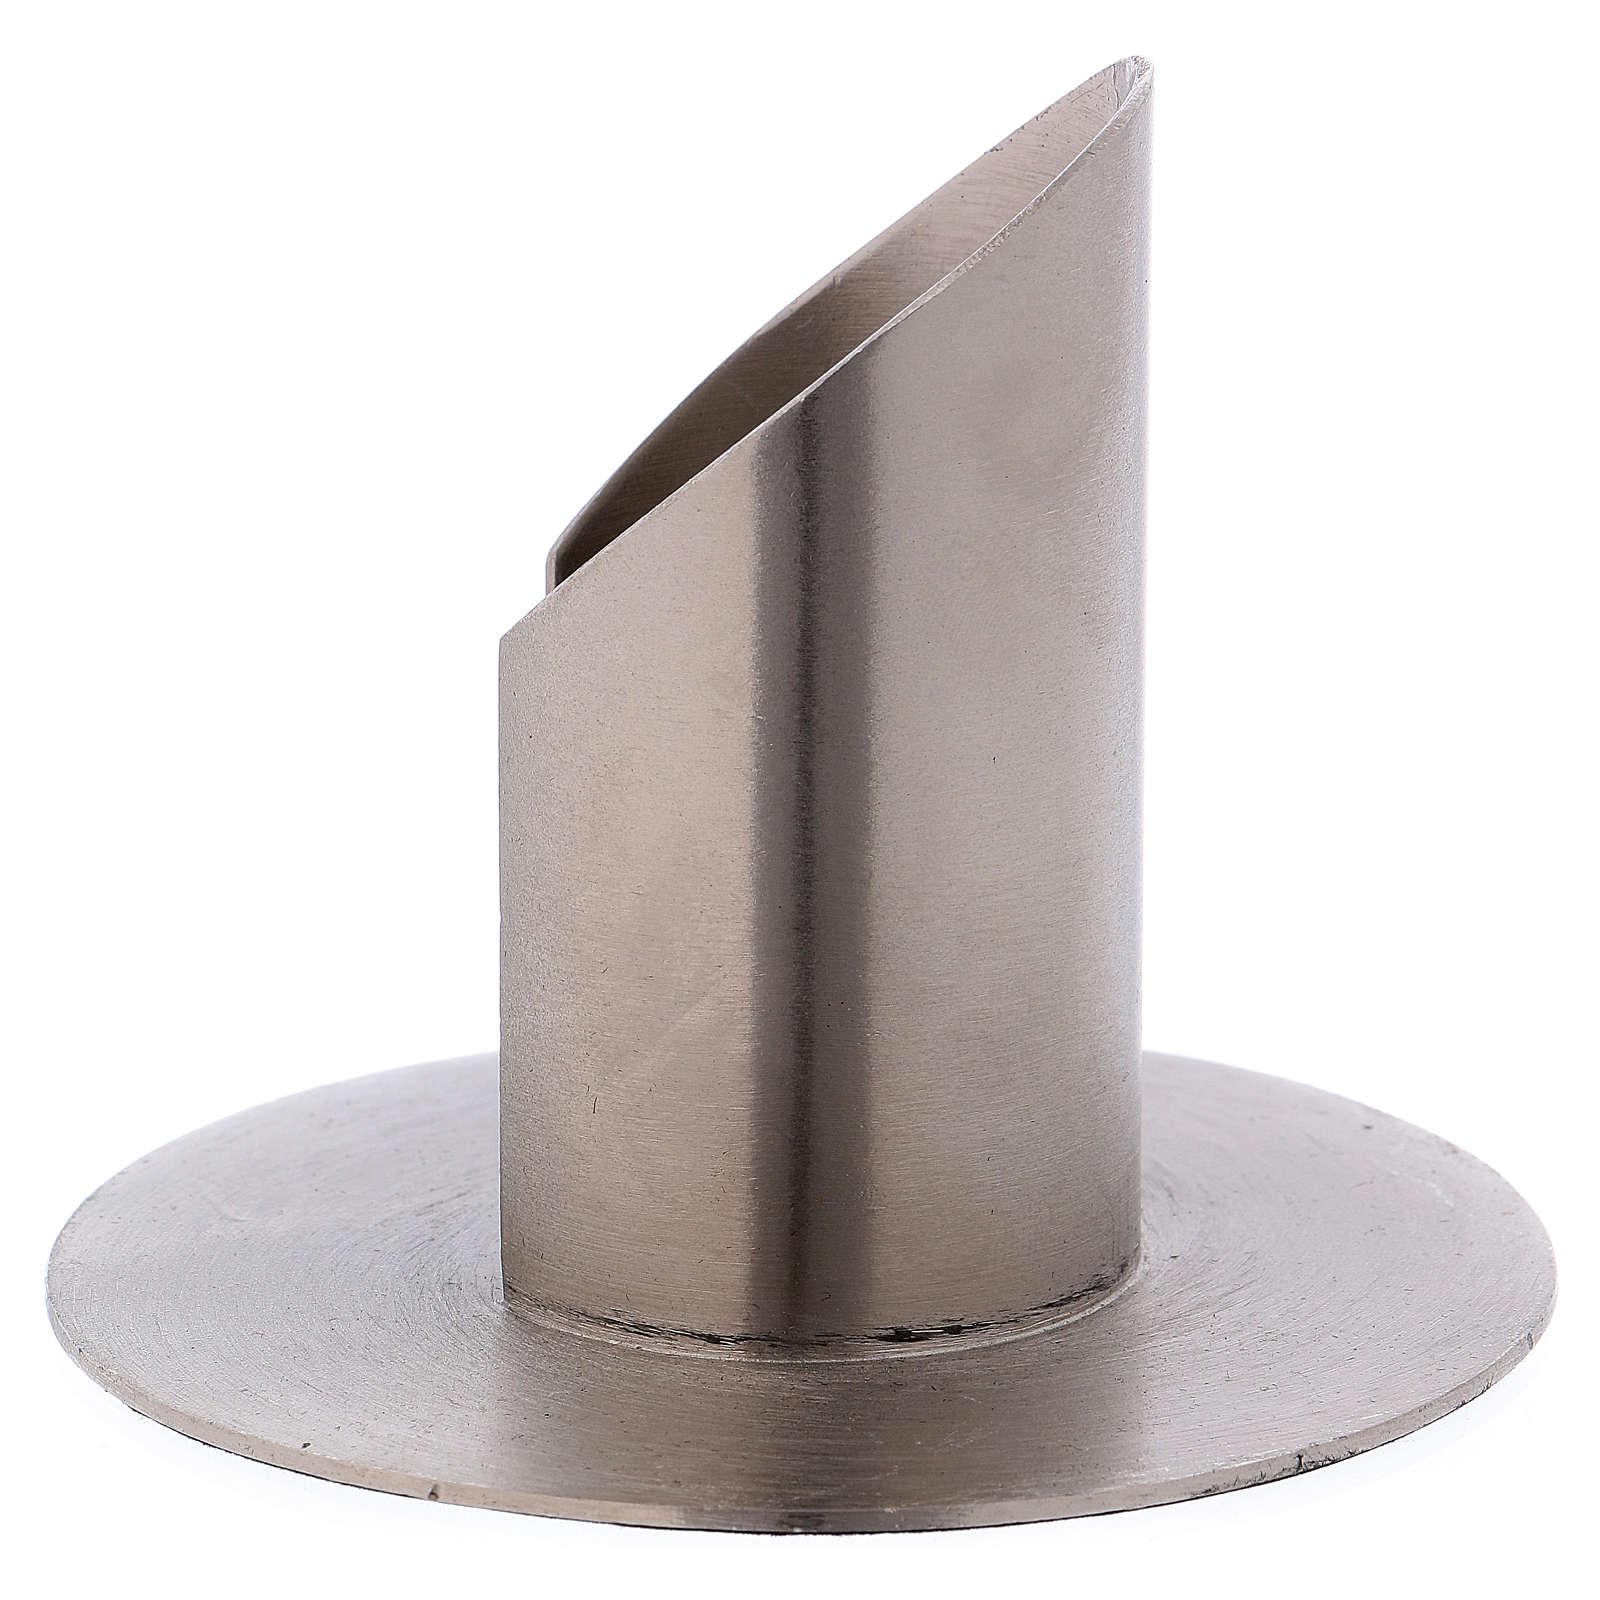 Portacandele tubolare aperto ottone argentato 4